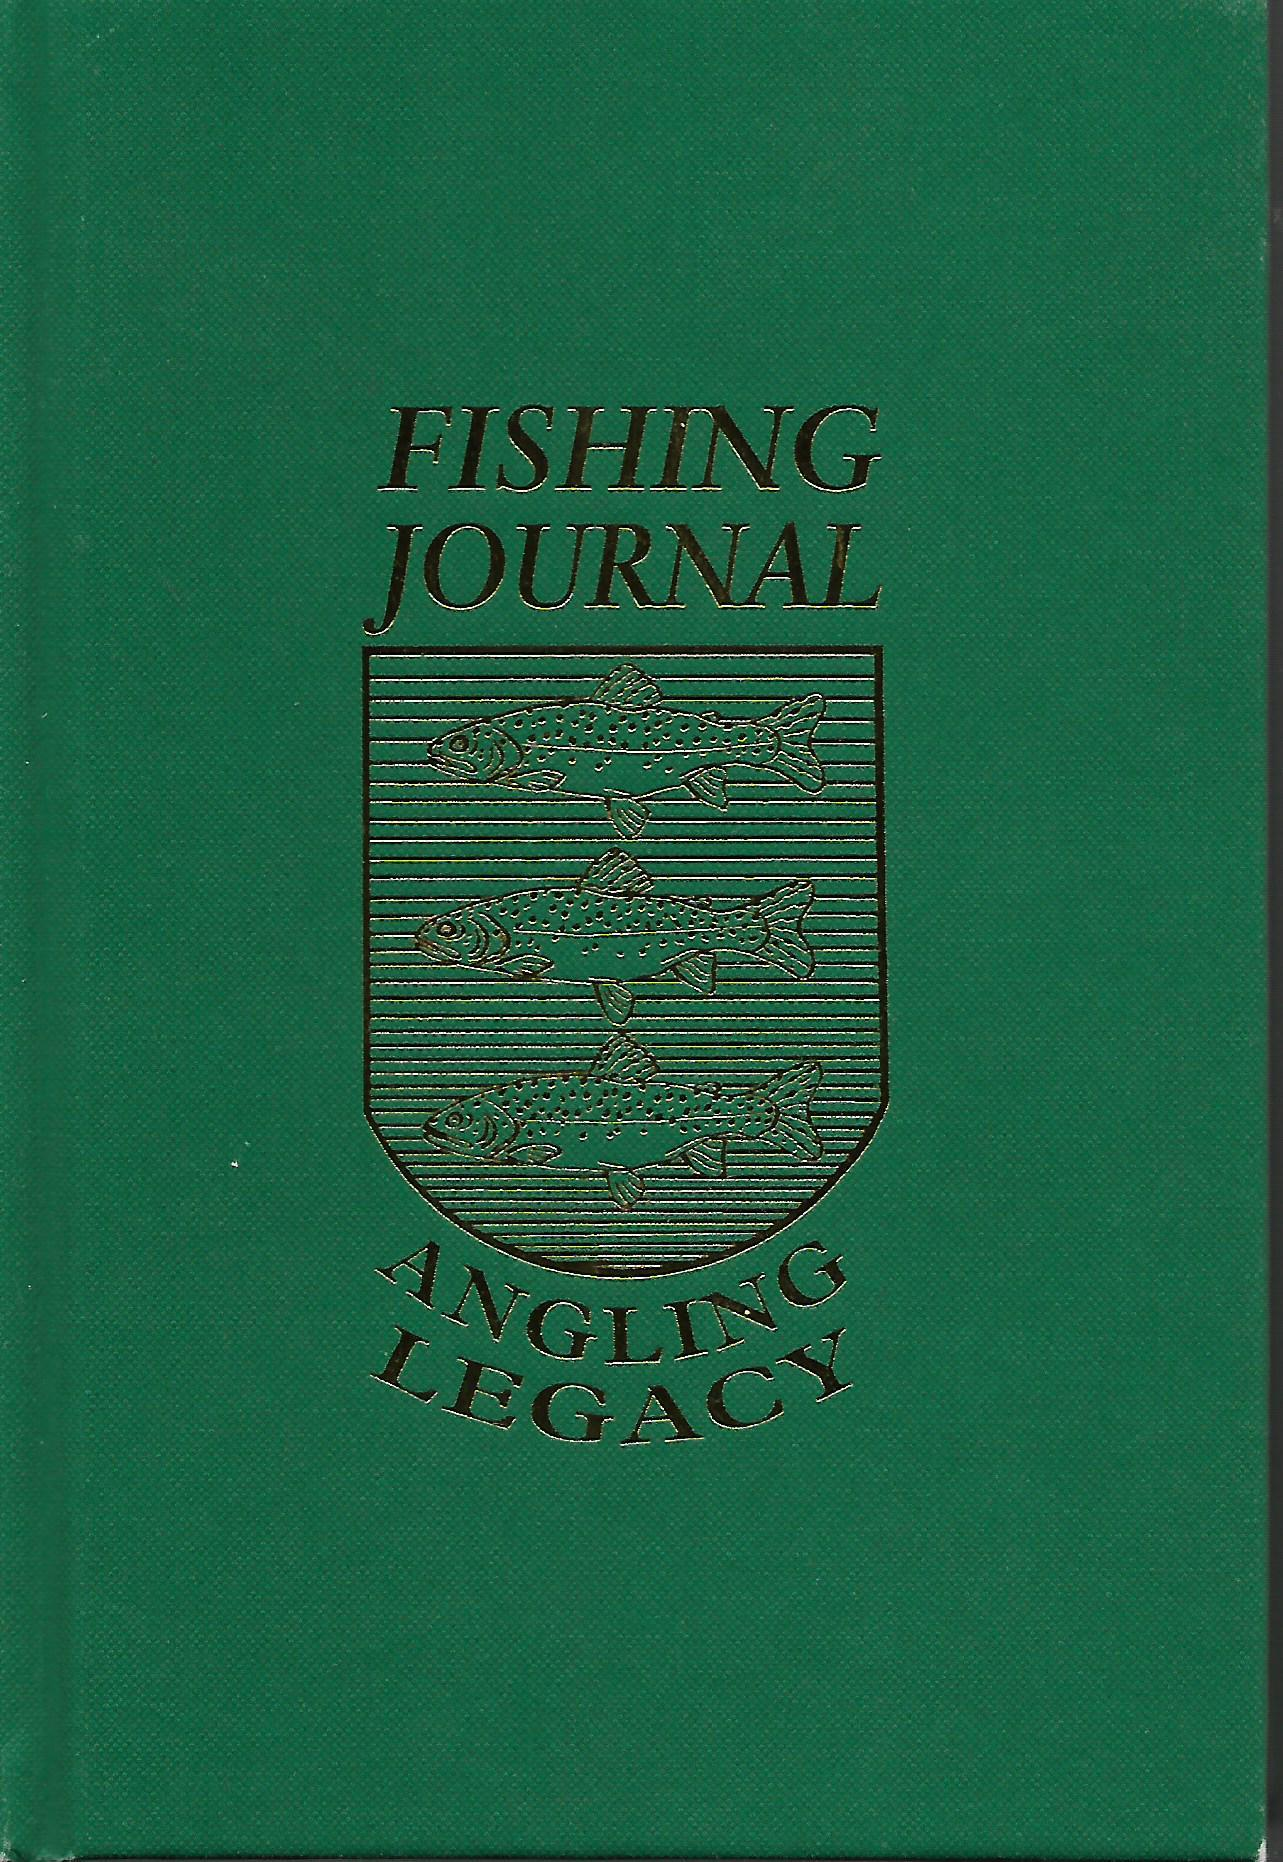 Fishing Journal Angling Legacy, Amato, Frank W.